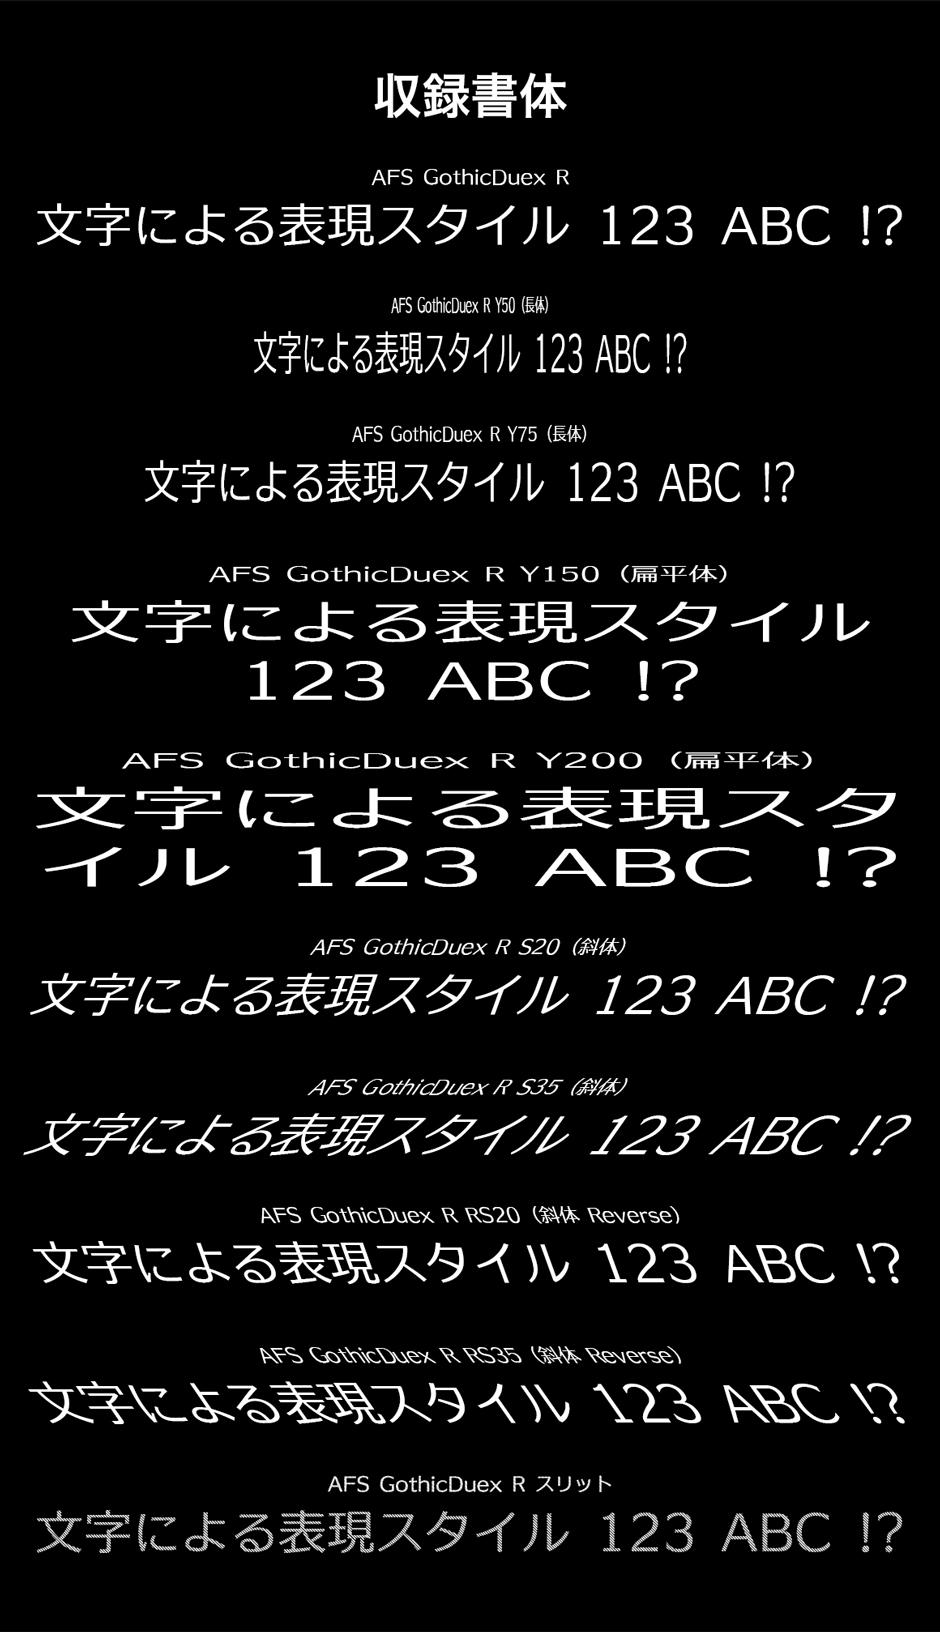 AFS ゴシックドゥ R